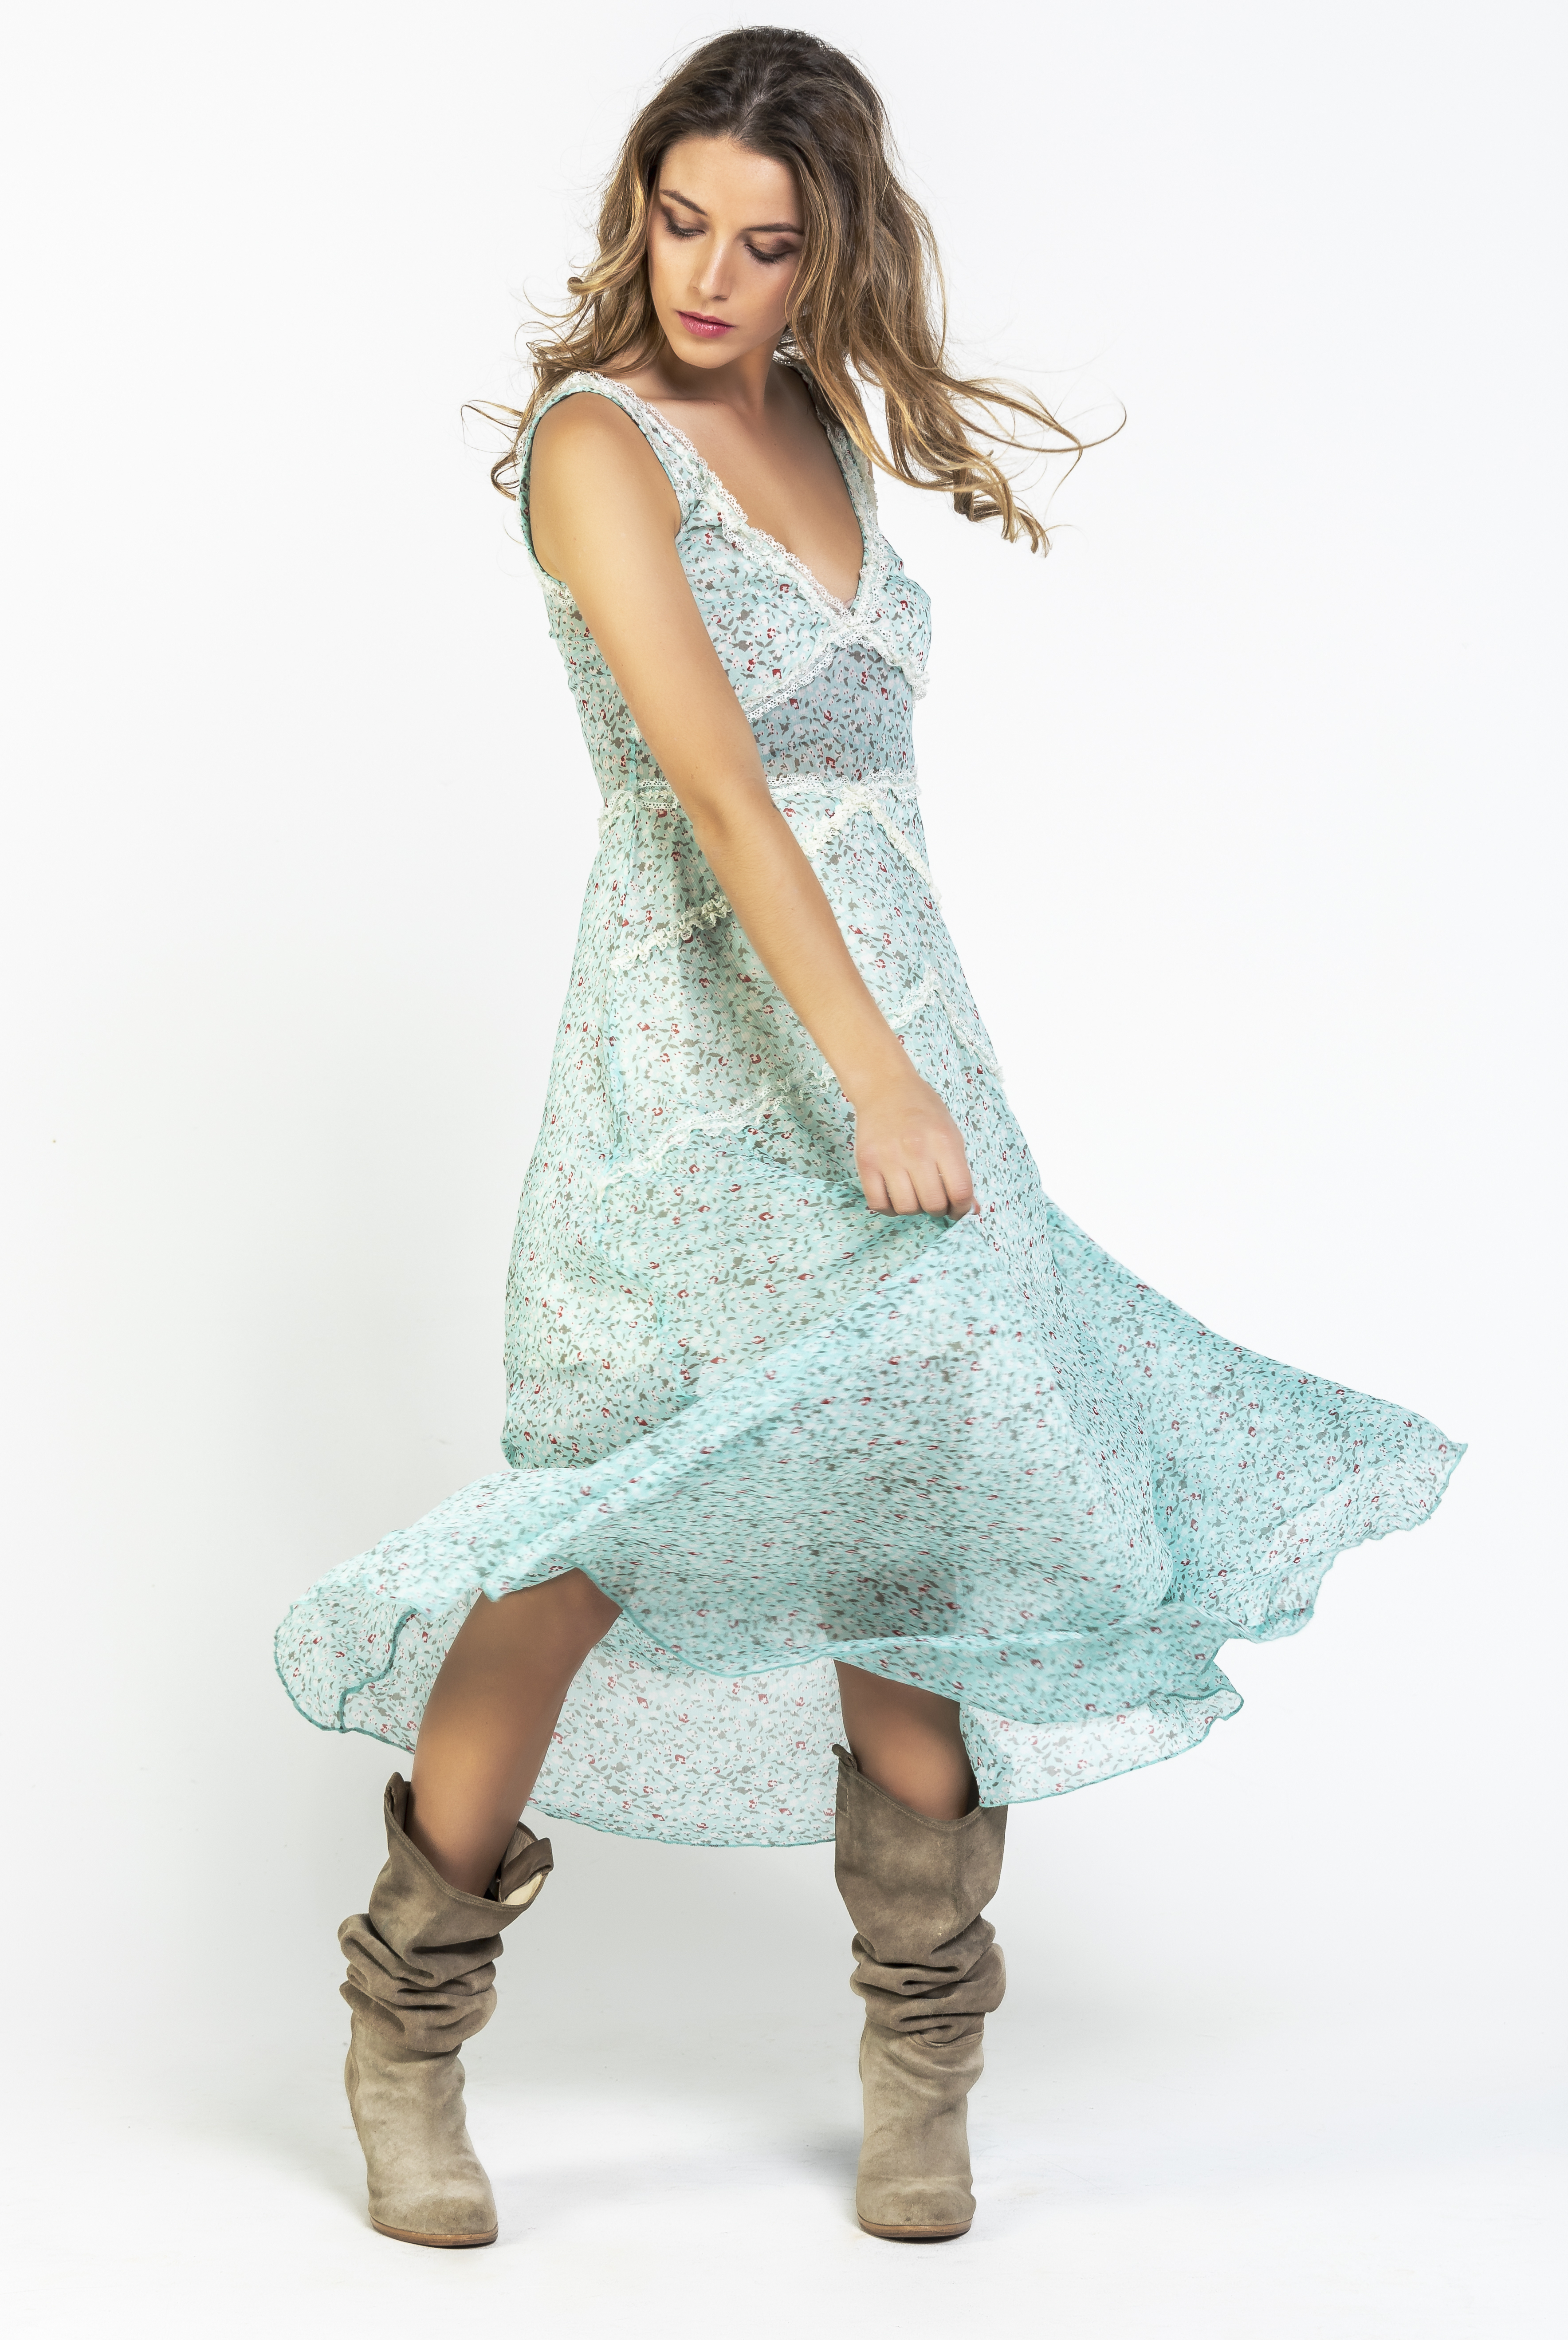 Savage Culture: Baby Roses Boho Chic Riverside Maxi Dress